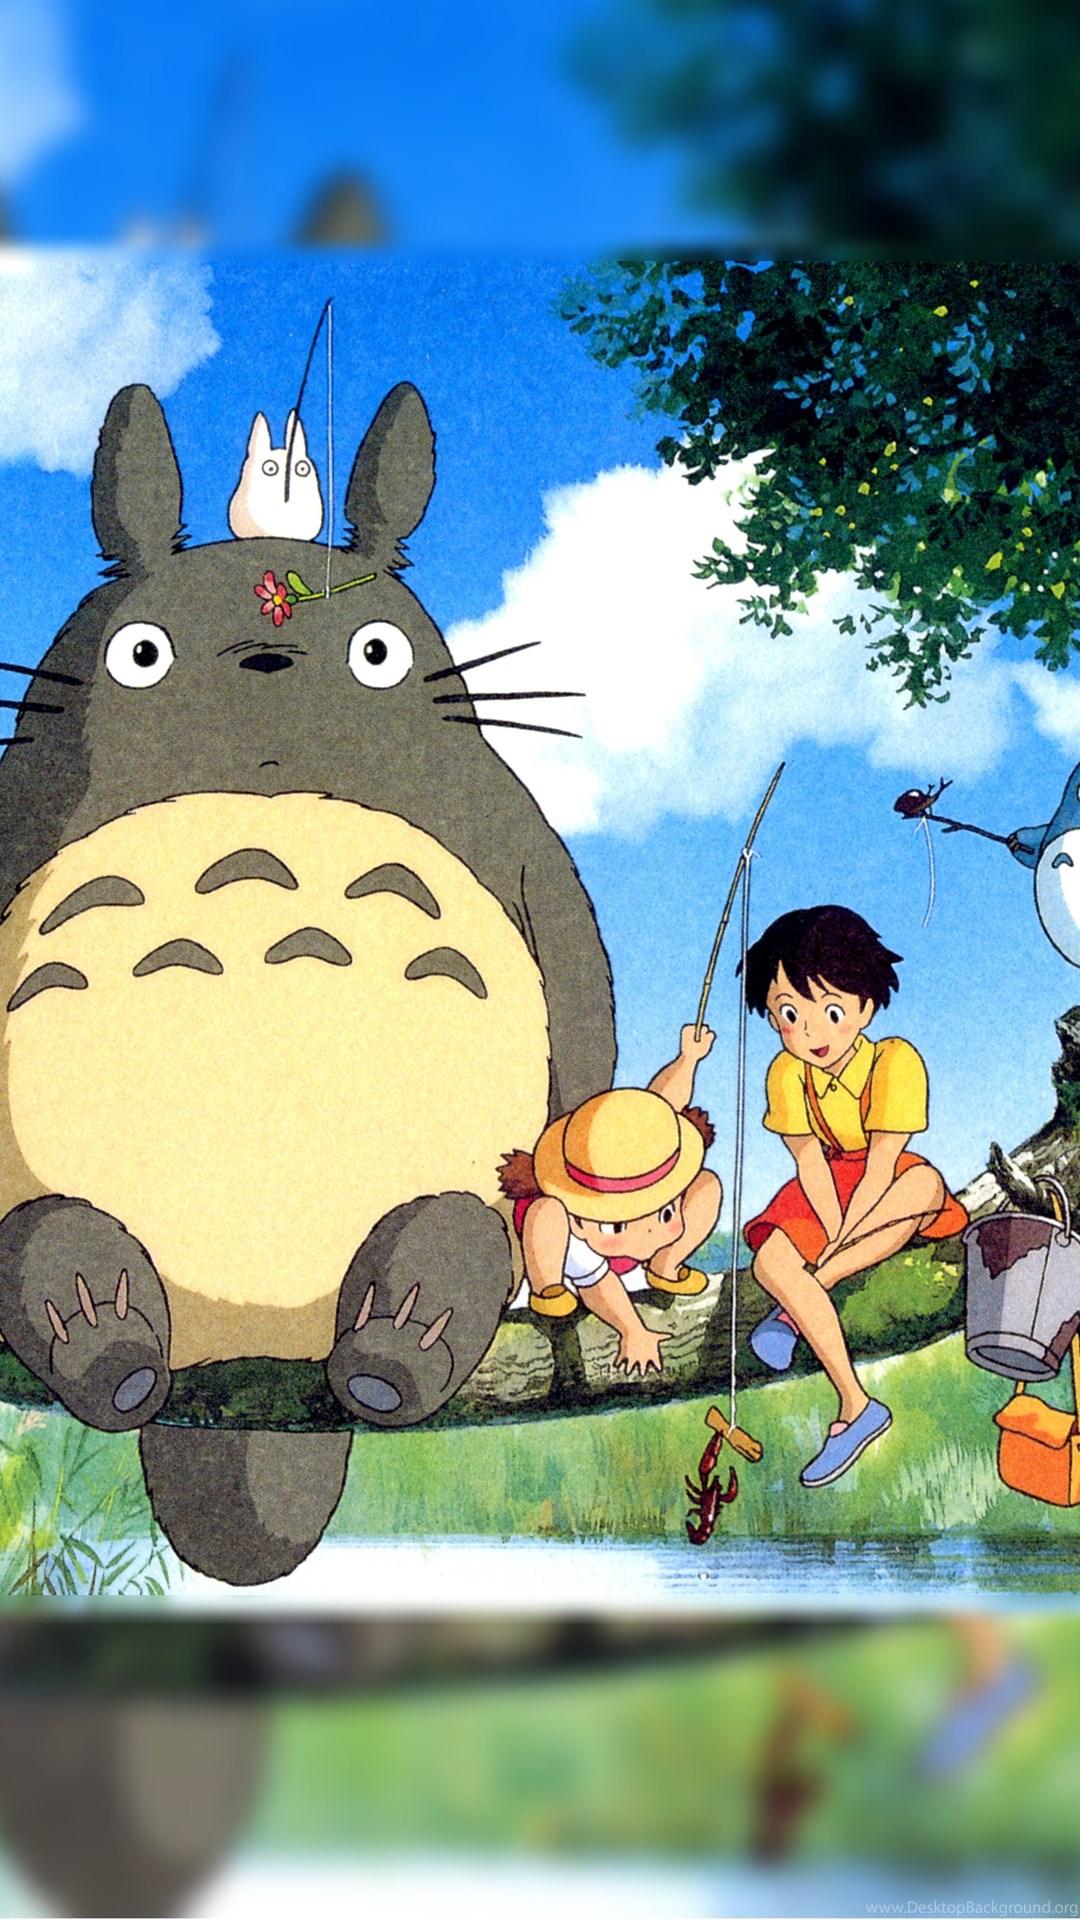 12 Quality My Neighbor Totoro Wallpapers Anime Amp Manga